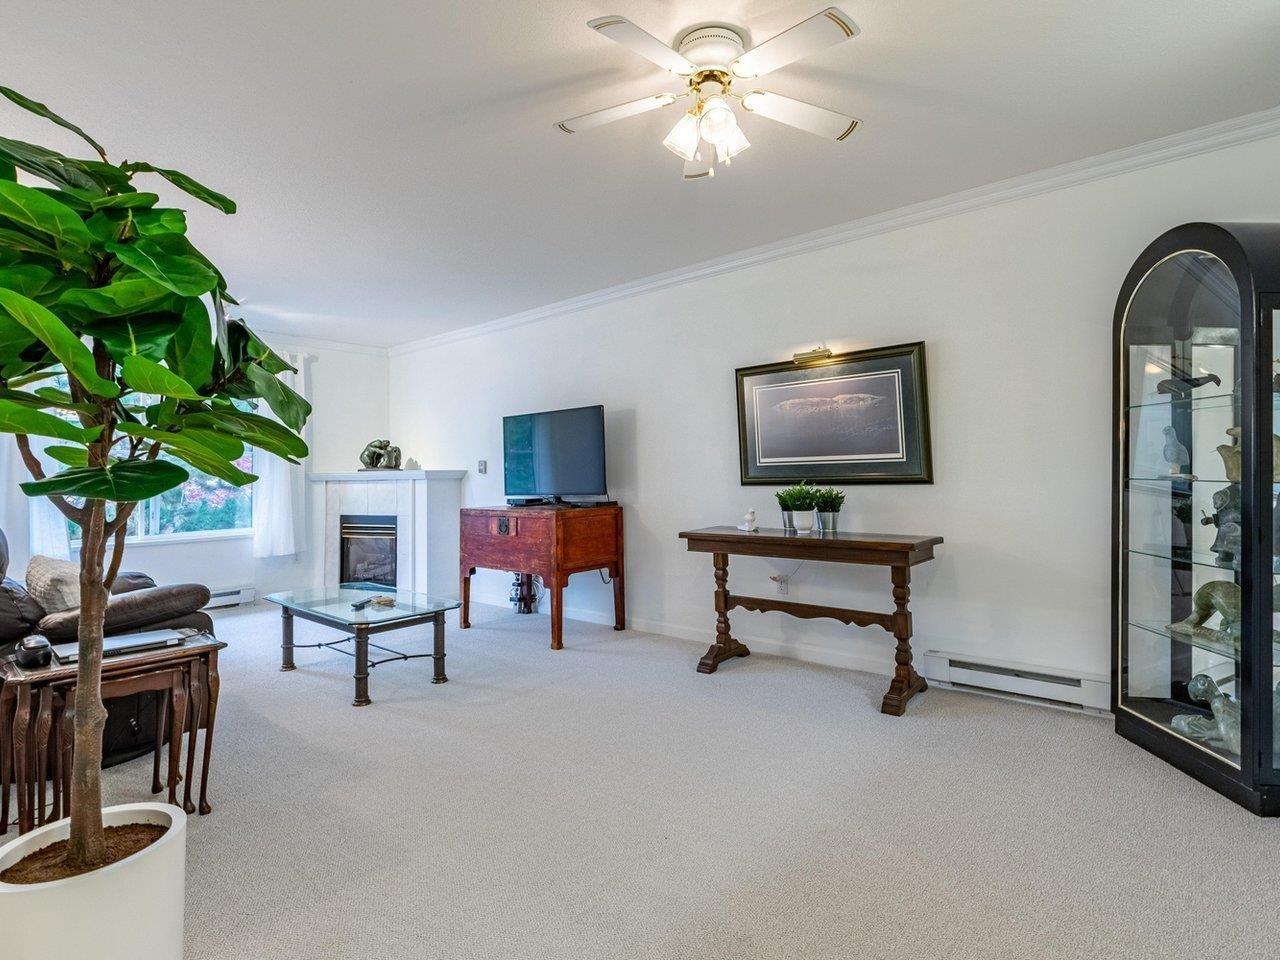 306 15298 20 AVENUE - King George Corridor Apartment/Condo for sale, 2 Bedrooms (R2625551) - #10